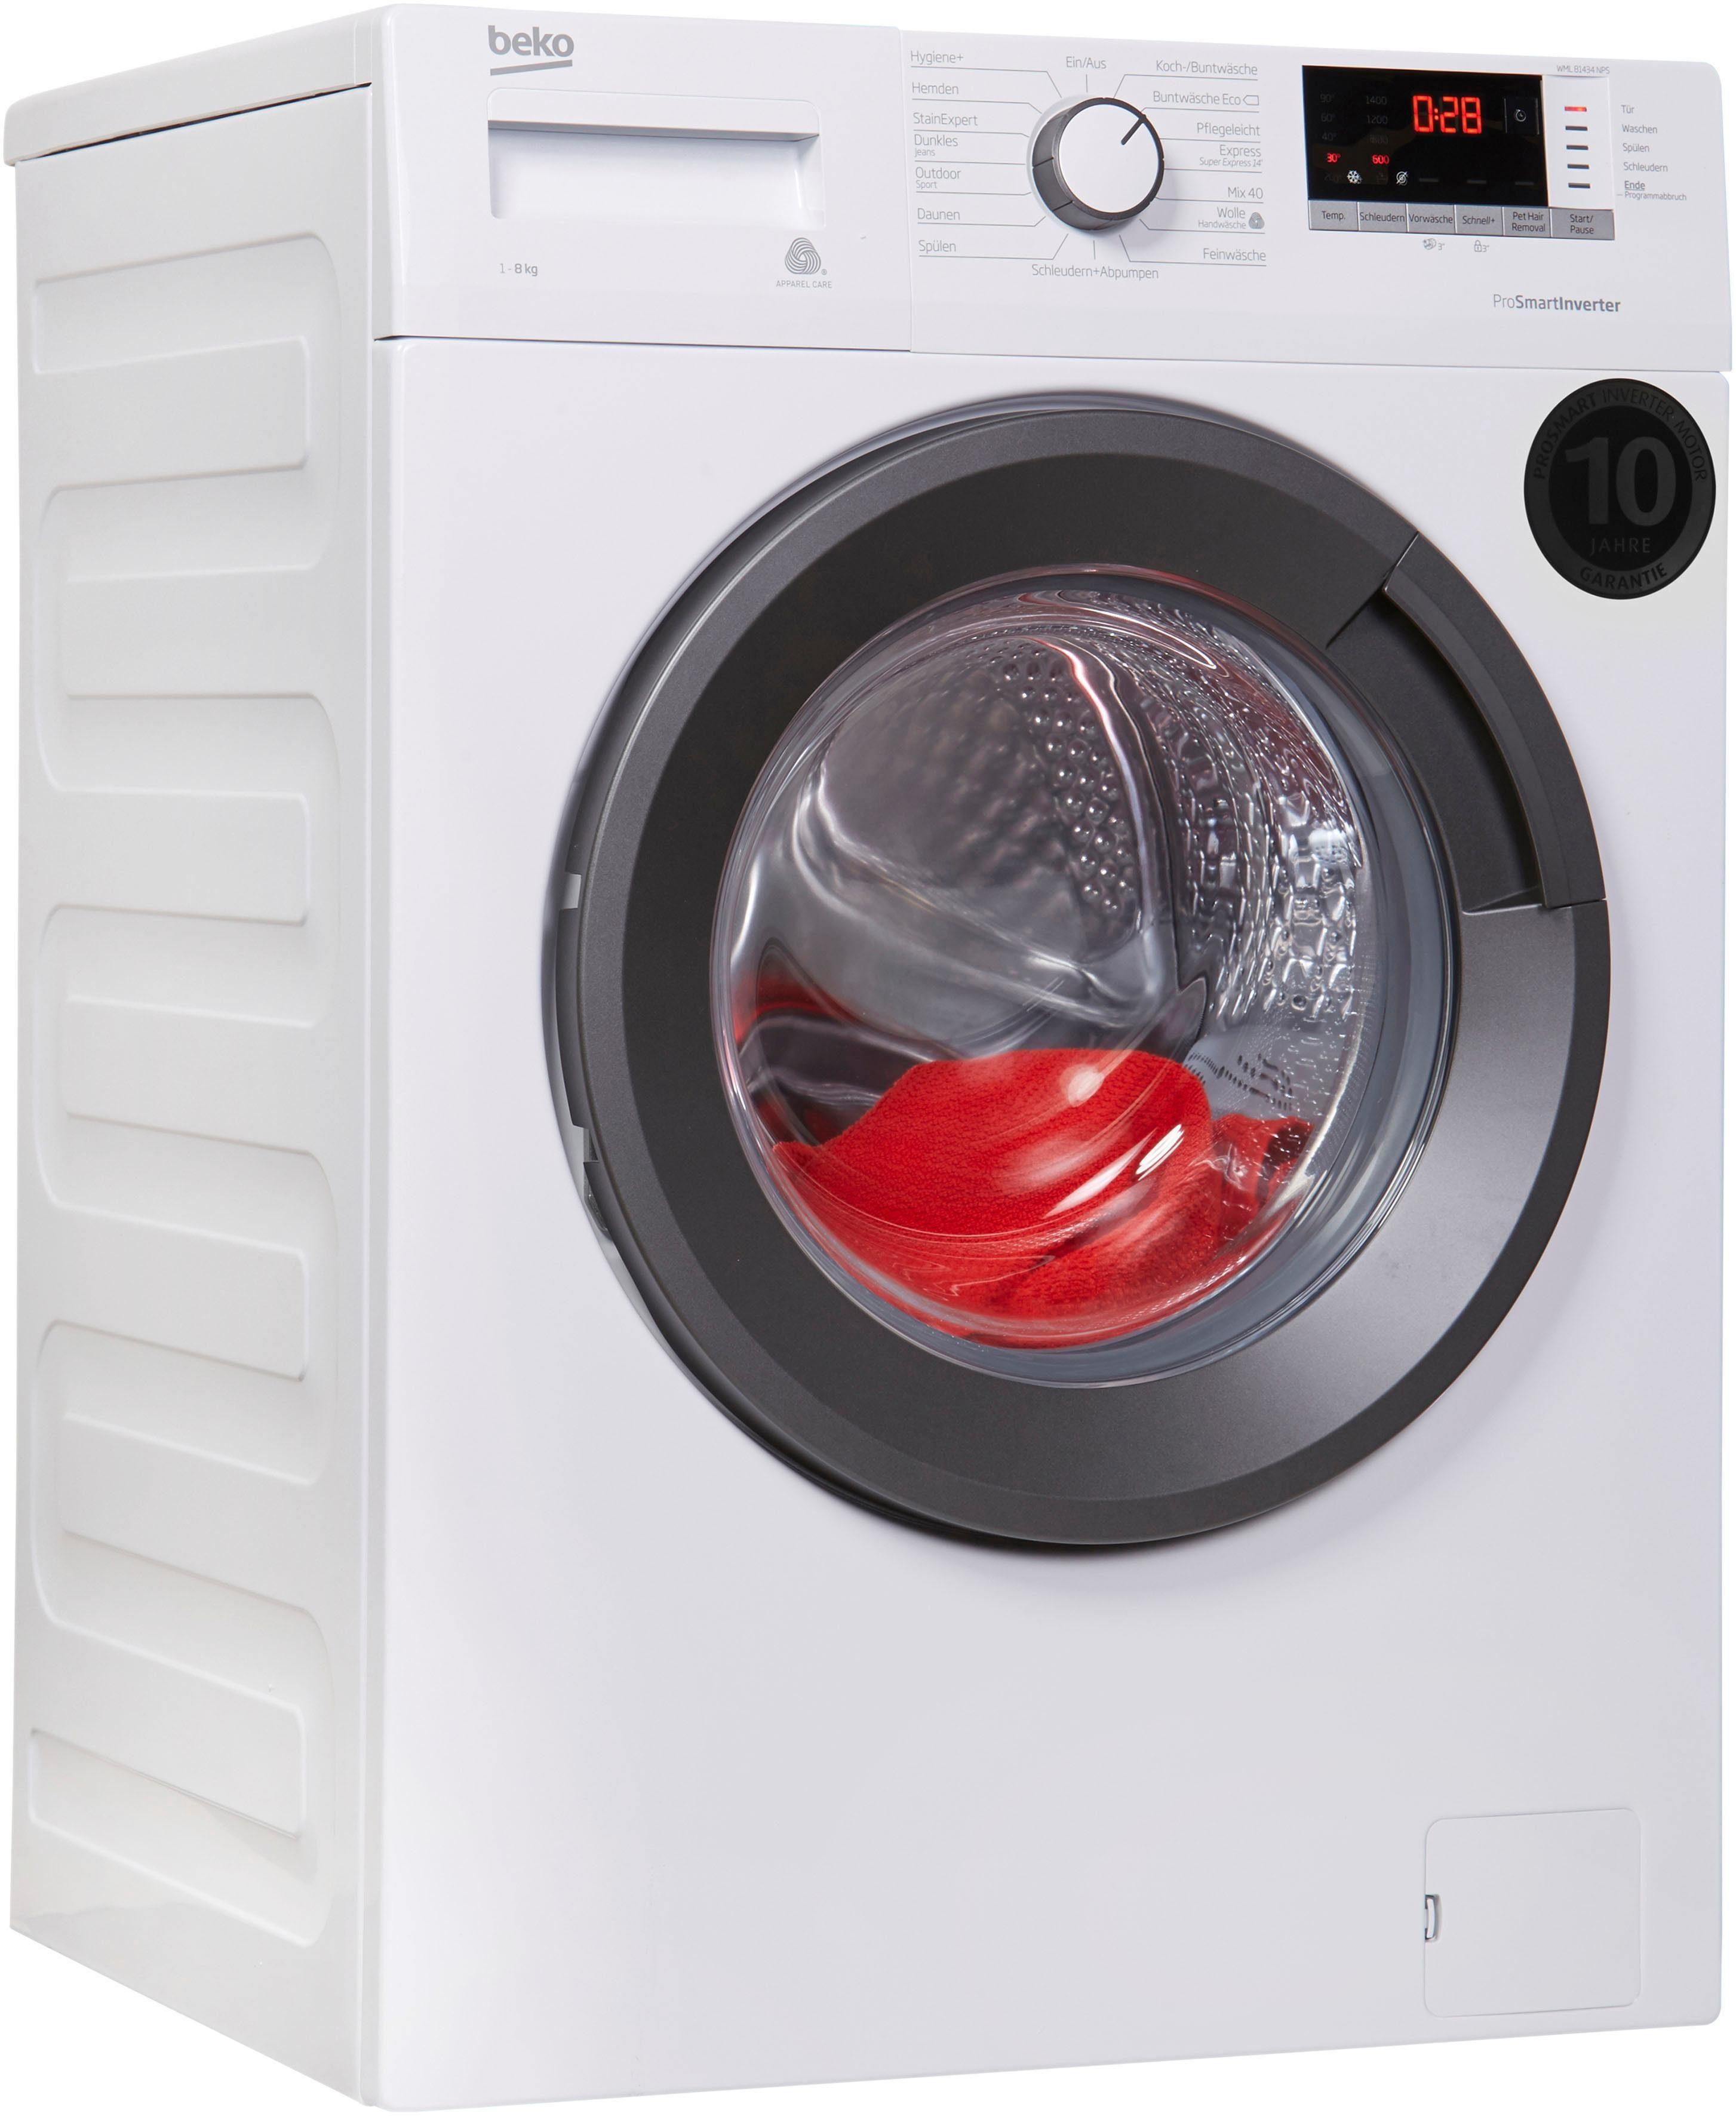 BEKO Waschmaschine WML81434NPS, 8 kg, 1400 U/Min